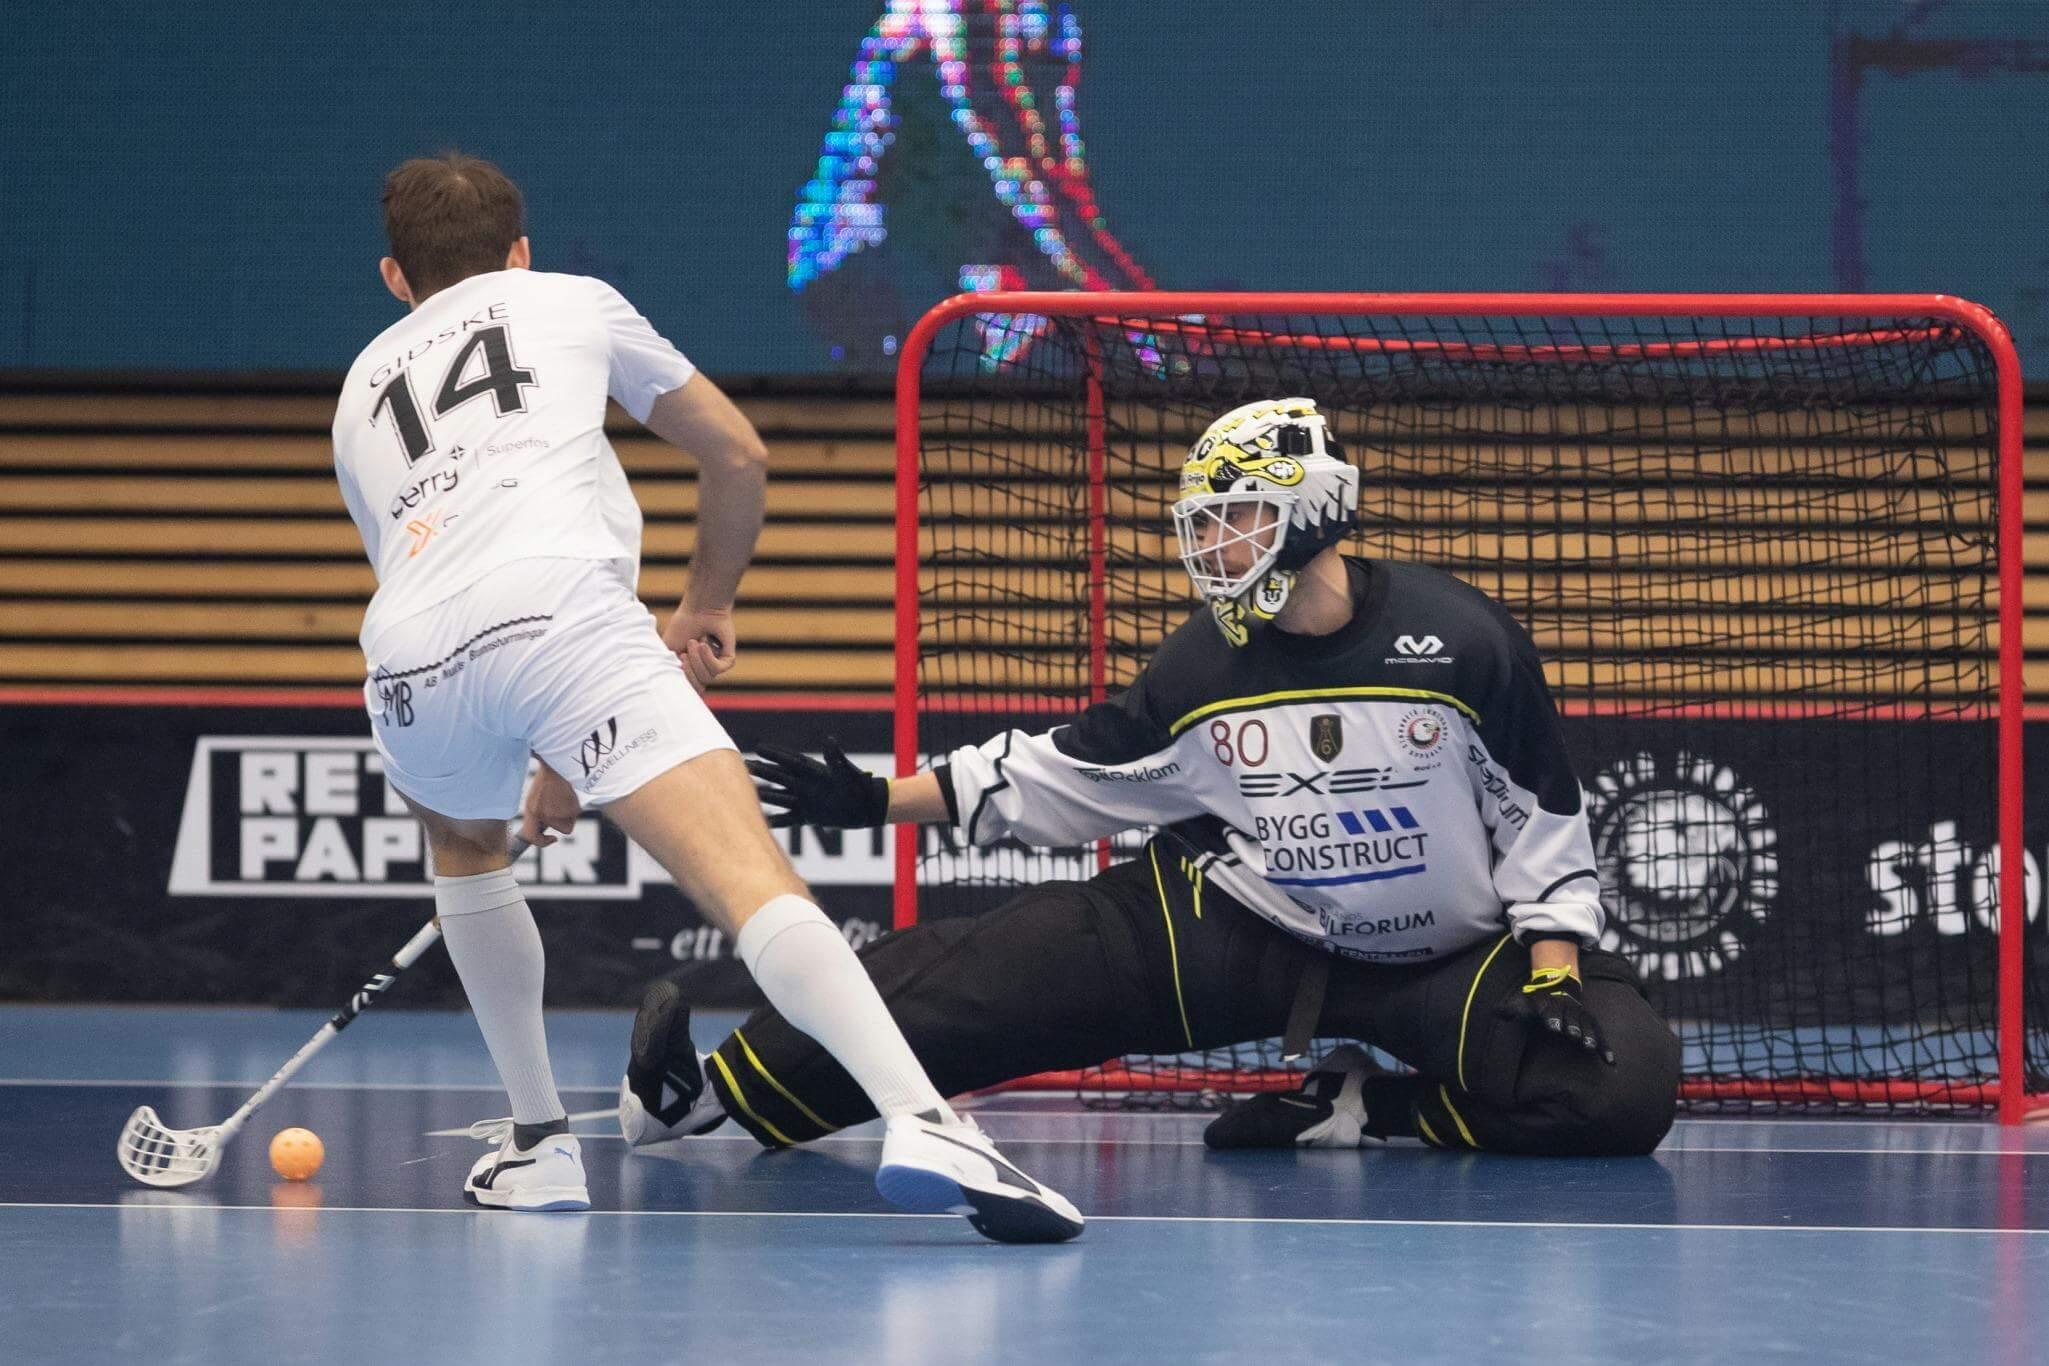 Daniel Gidske har notert seg for seks poeng (3+3) i sluttspillet så langt. Foto: Peter Bohlin